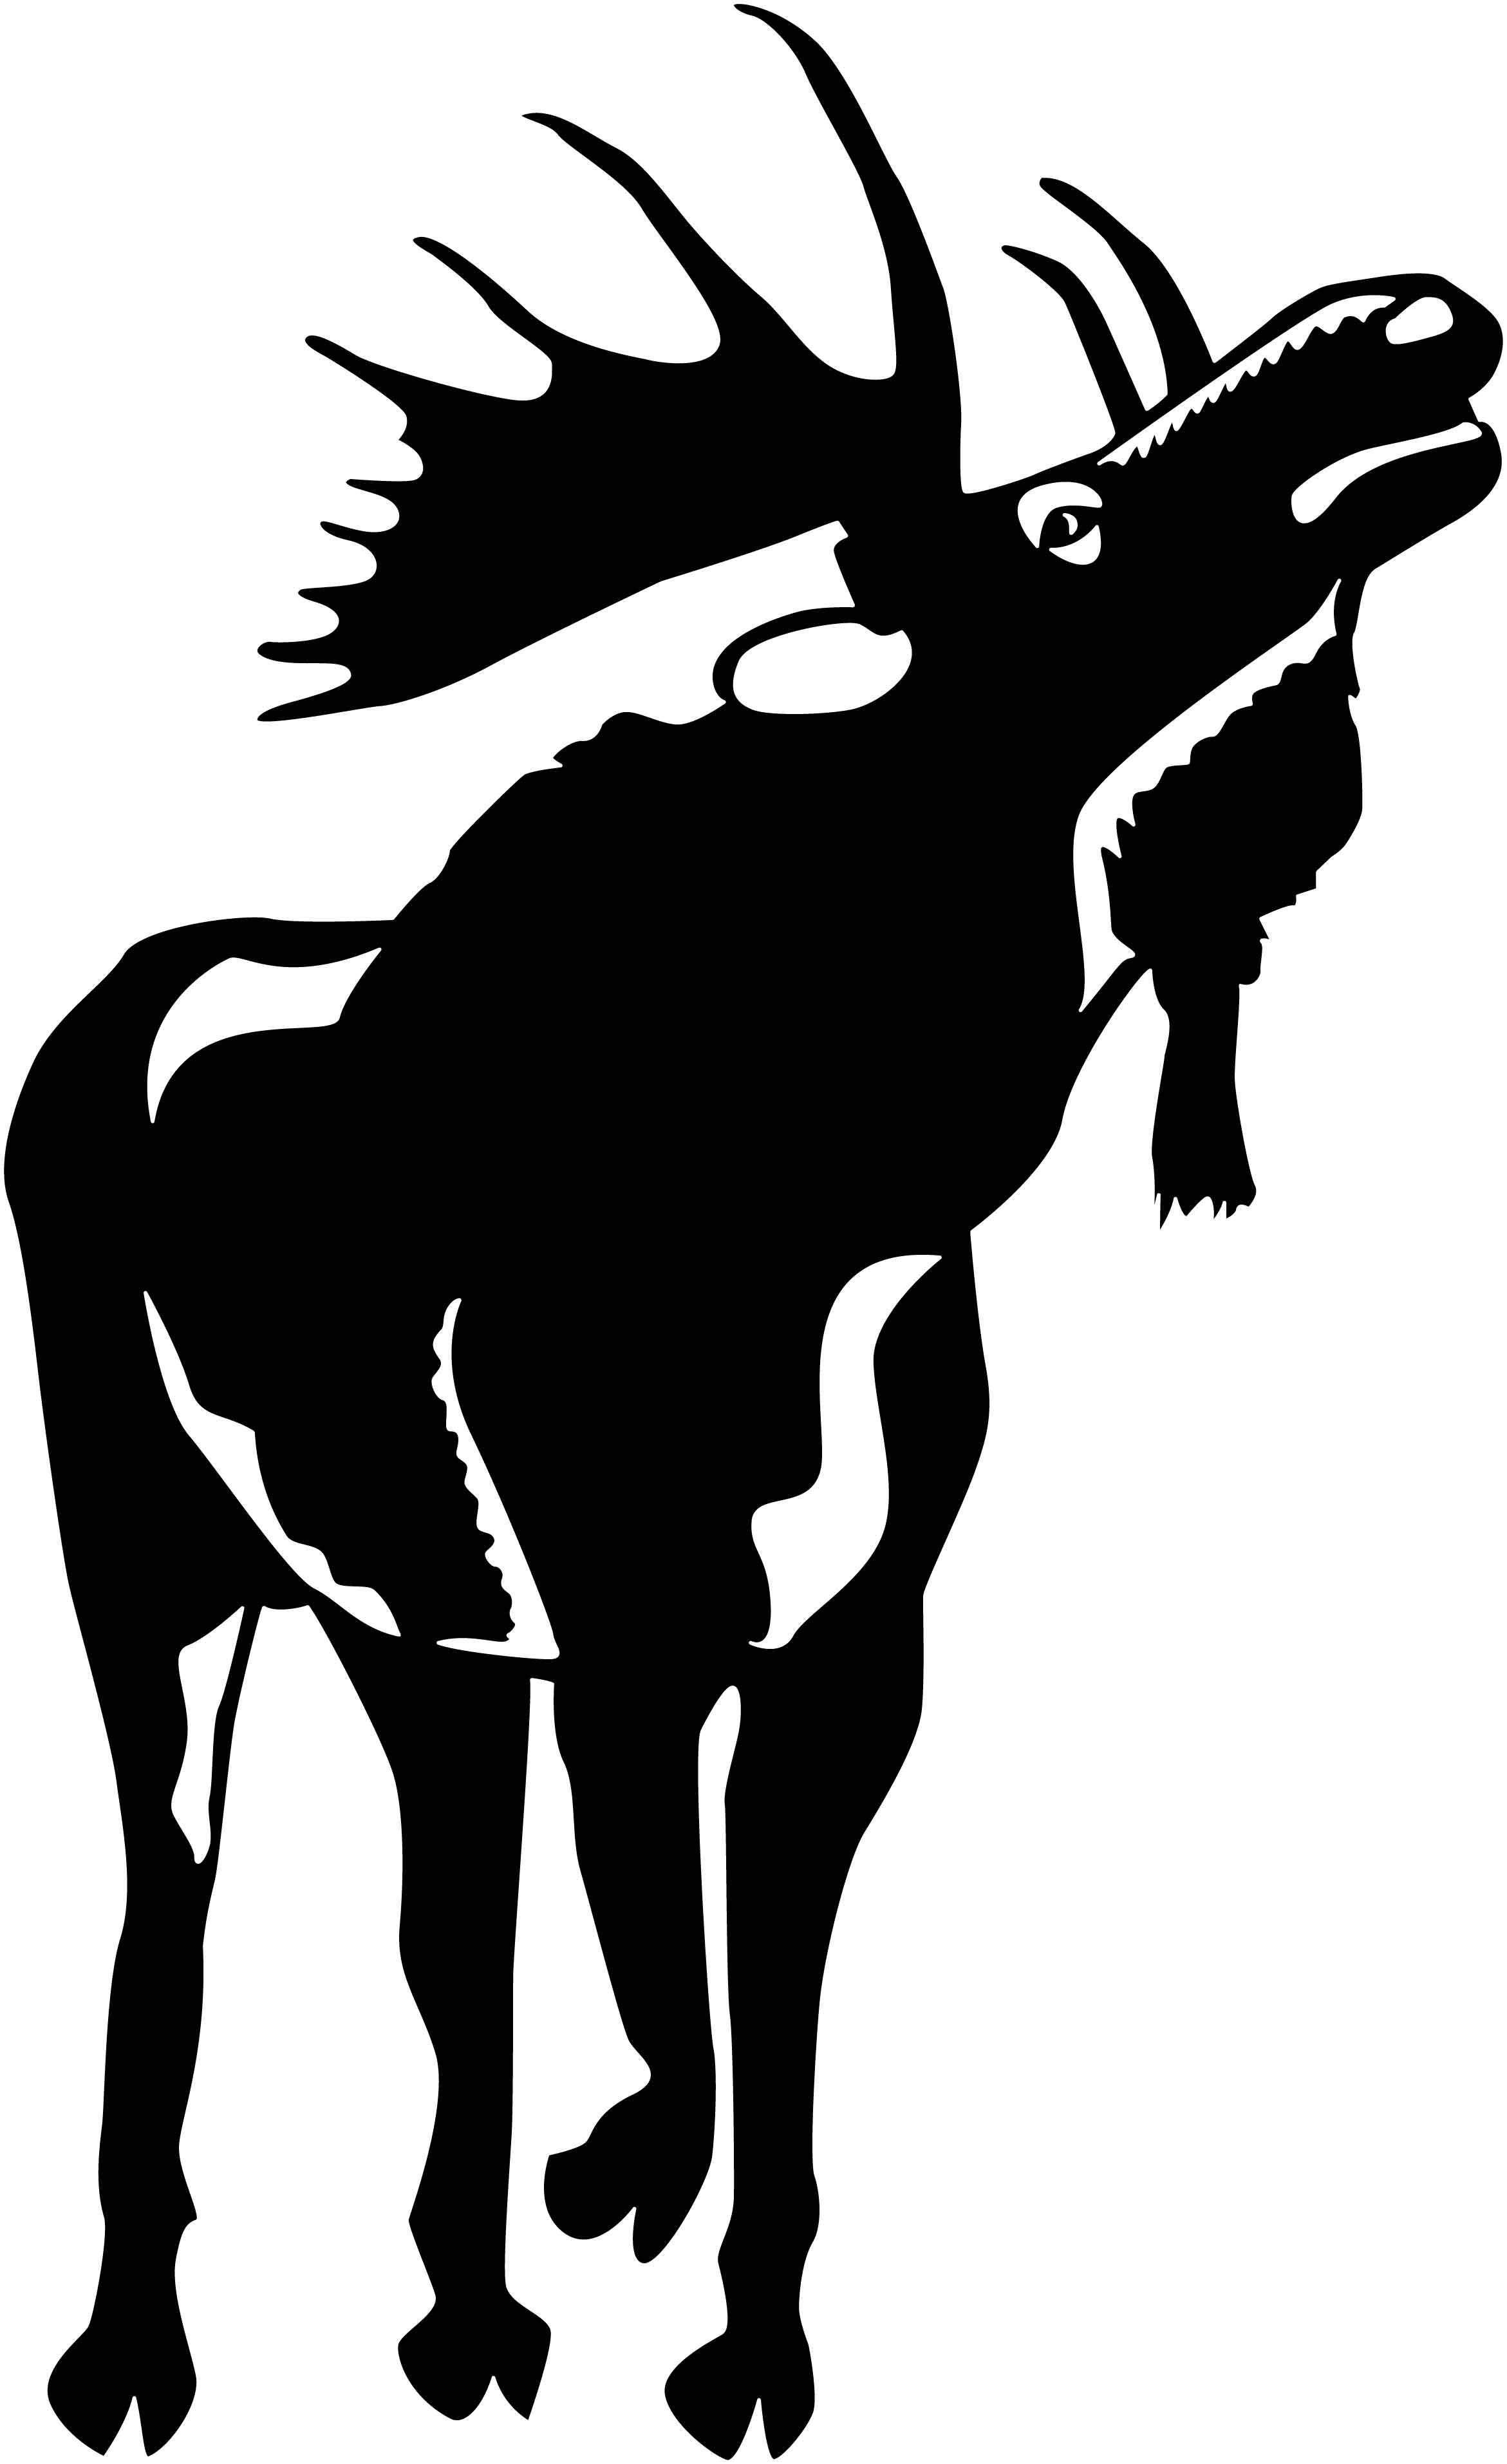 Moose Free DXF file Moose silhouette, Scroll saw